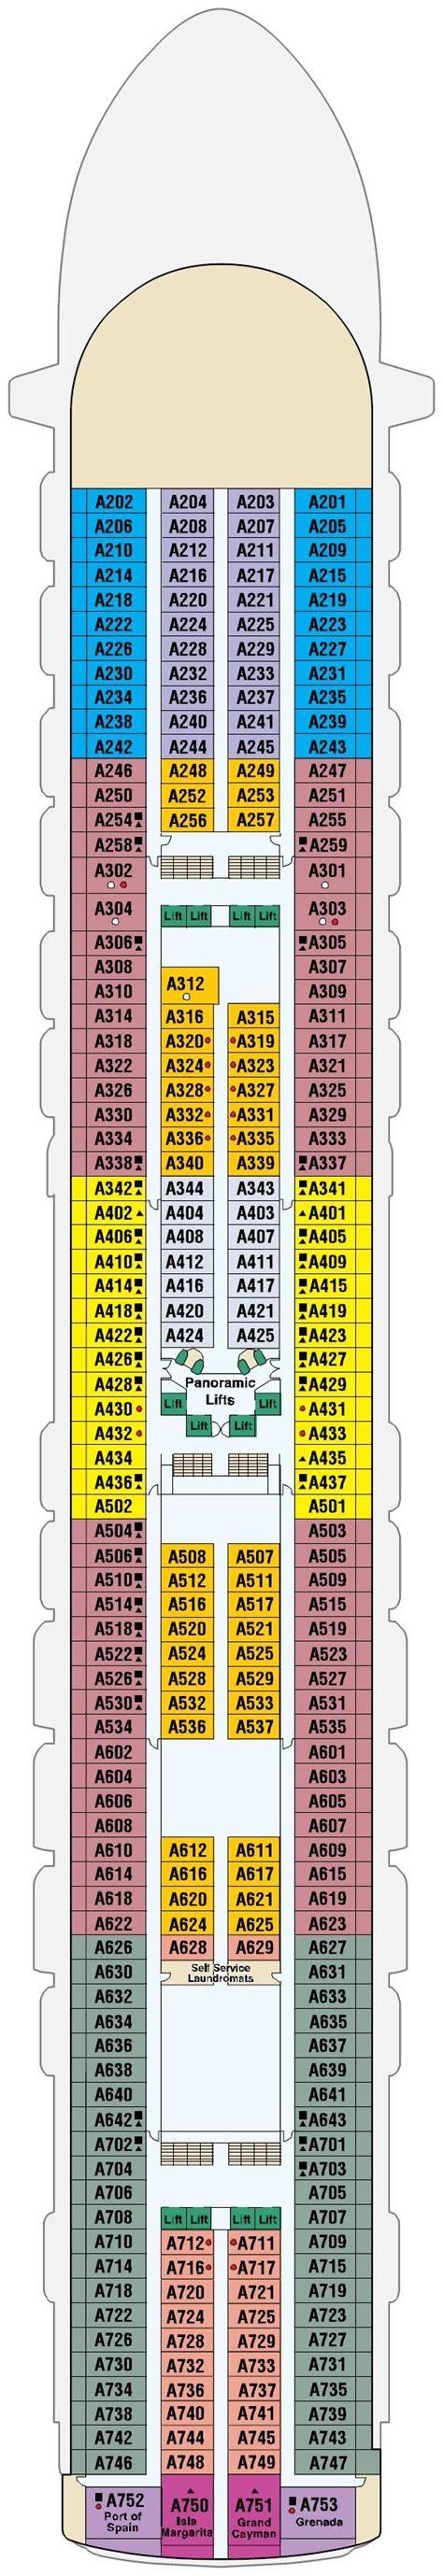 Princess Aloha Deck Plan by Cruises Aboard Emerald Princess Princess Cruises